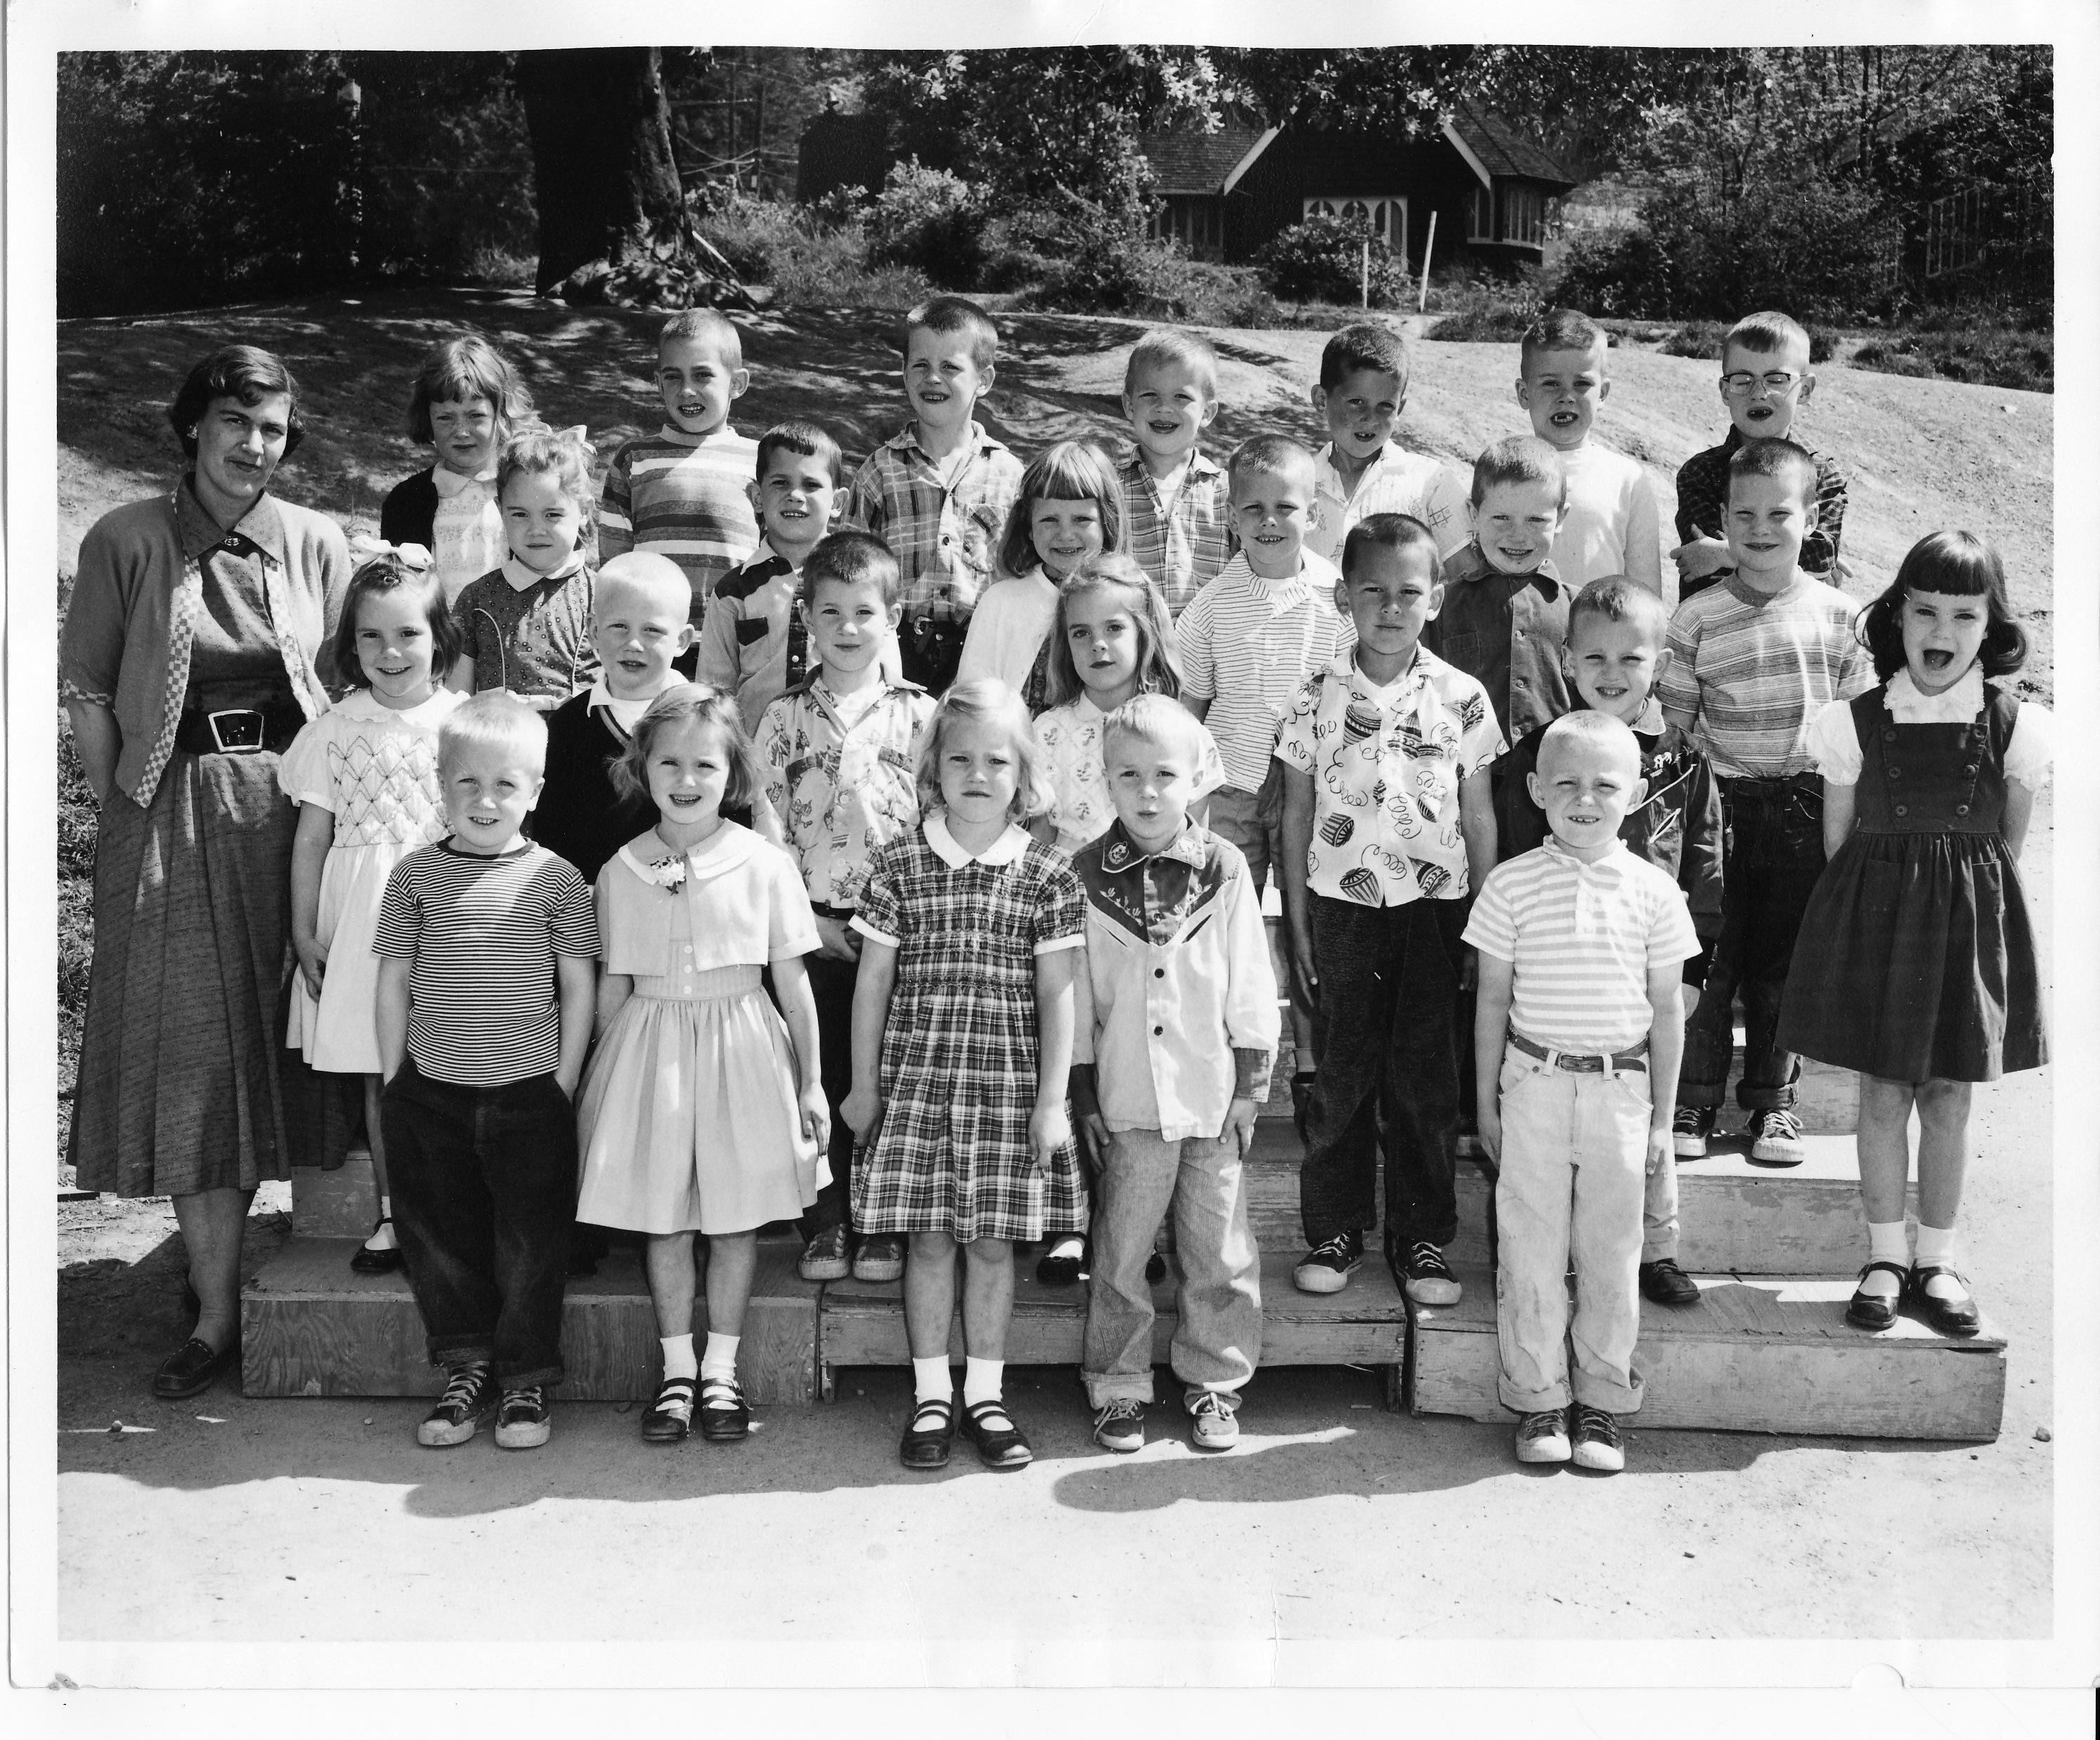 Elementary School Photos Mercer Island Wa 1957 64